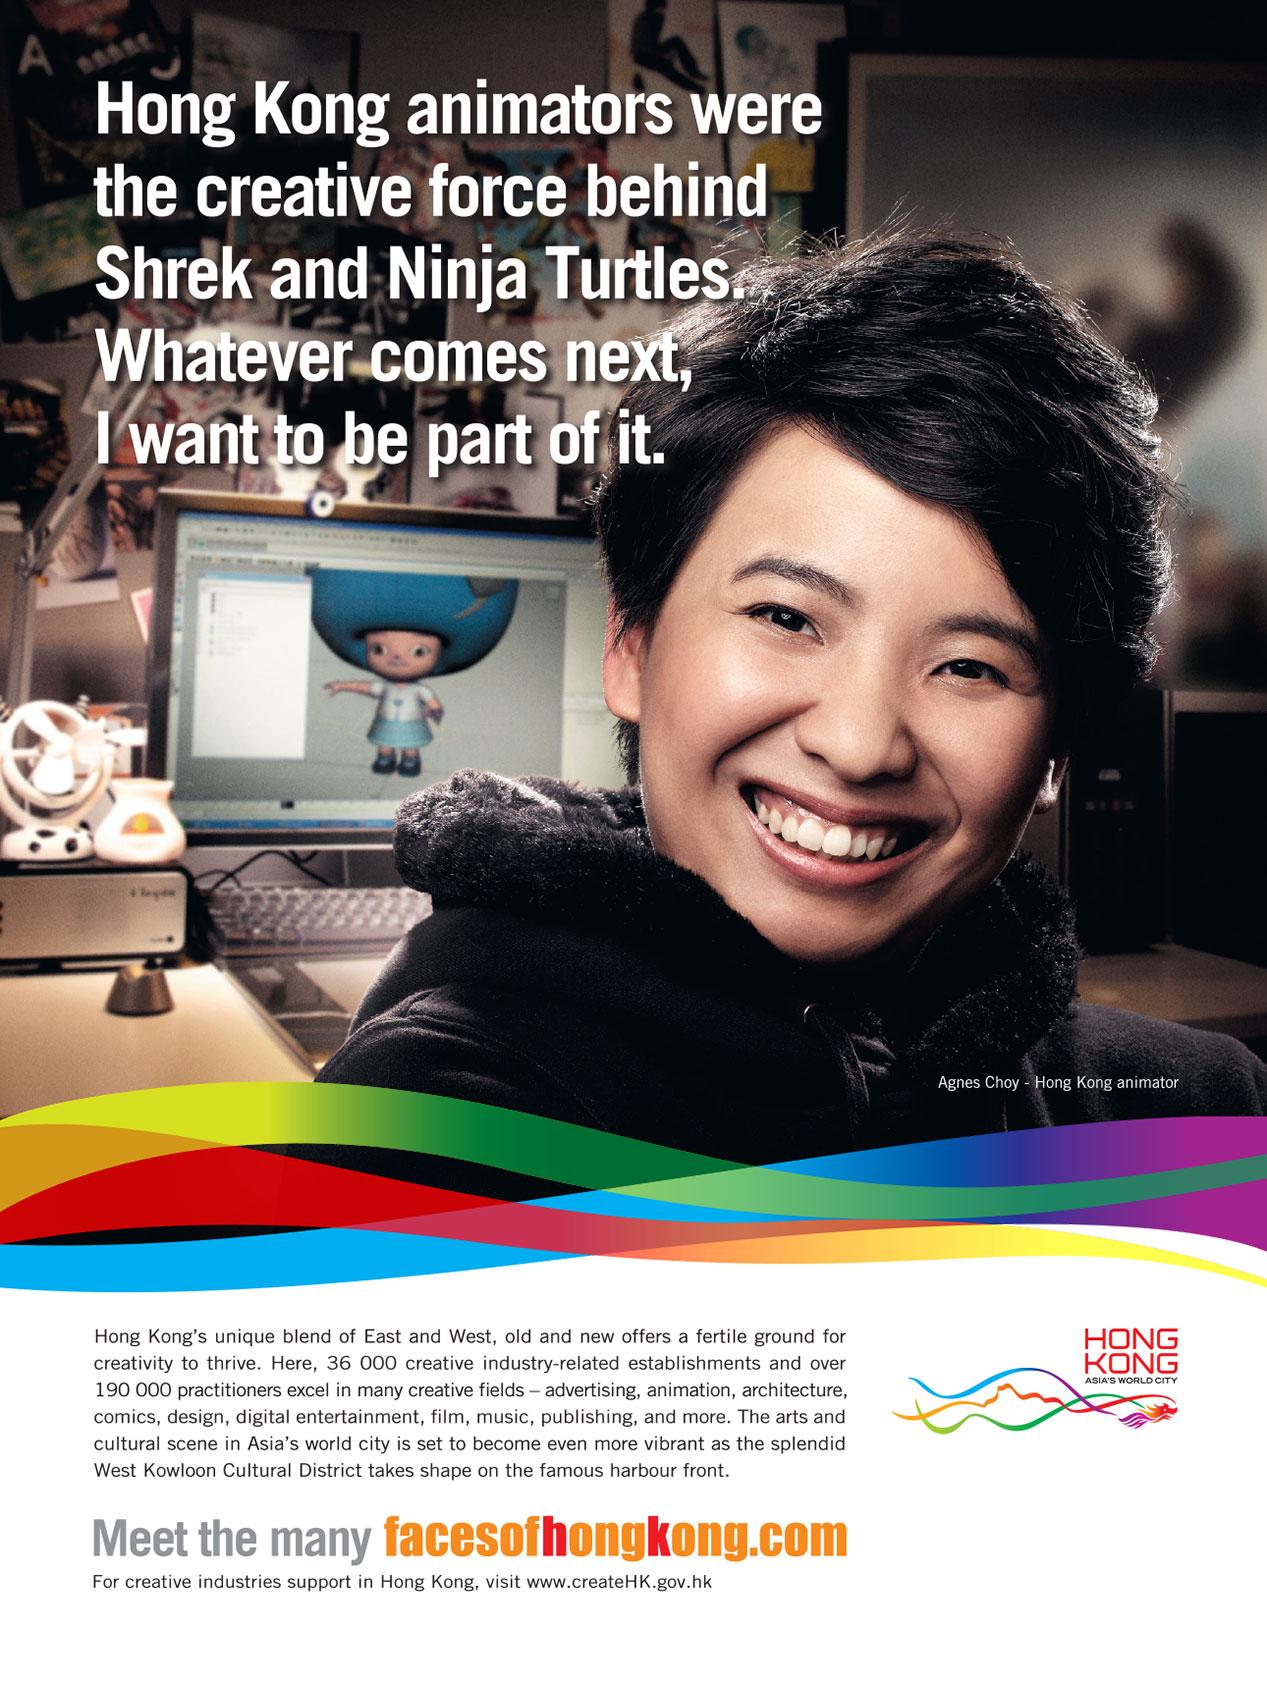 Faces of Hong Kong poster - Agnes Choy